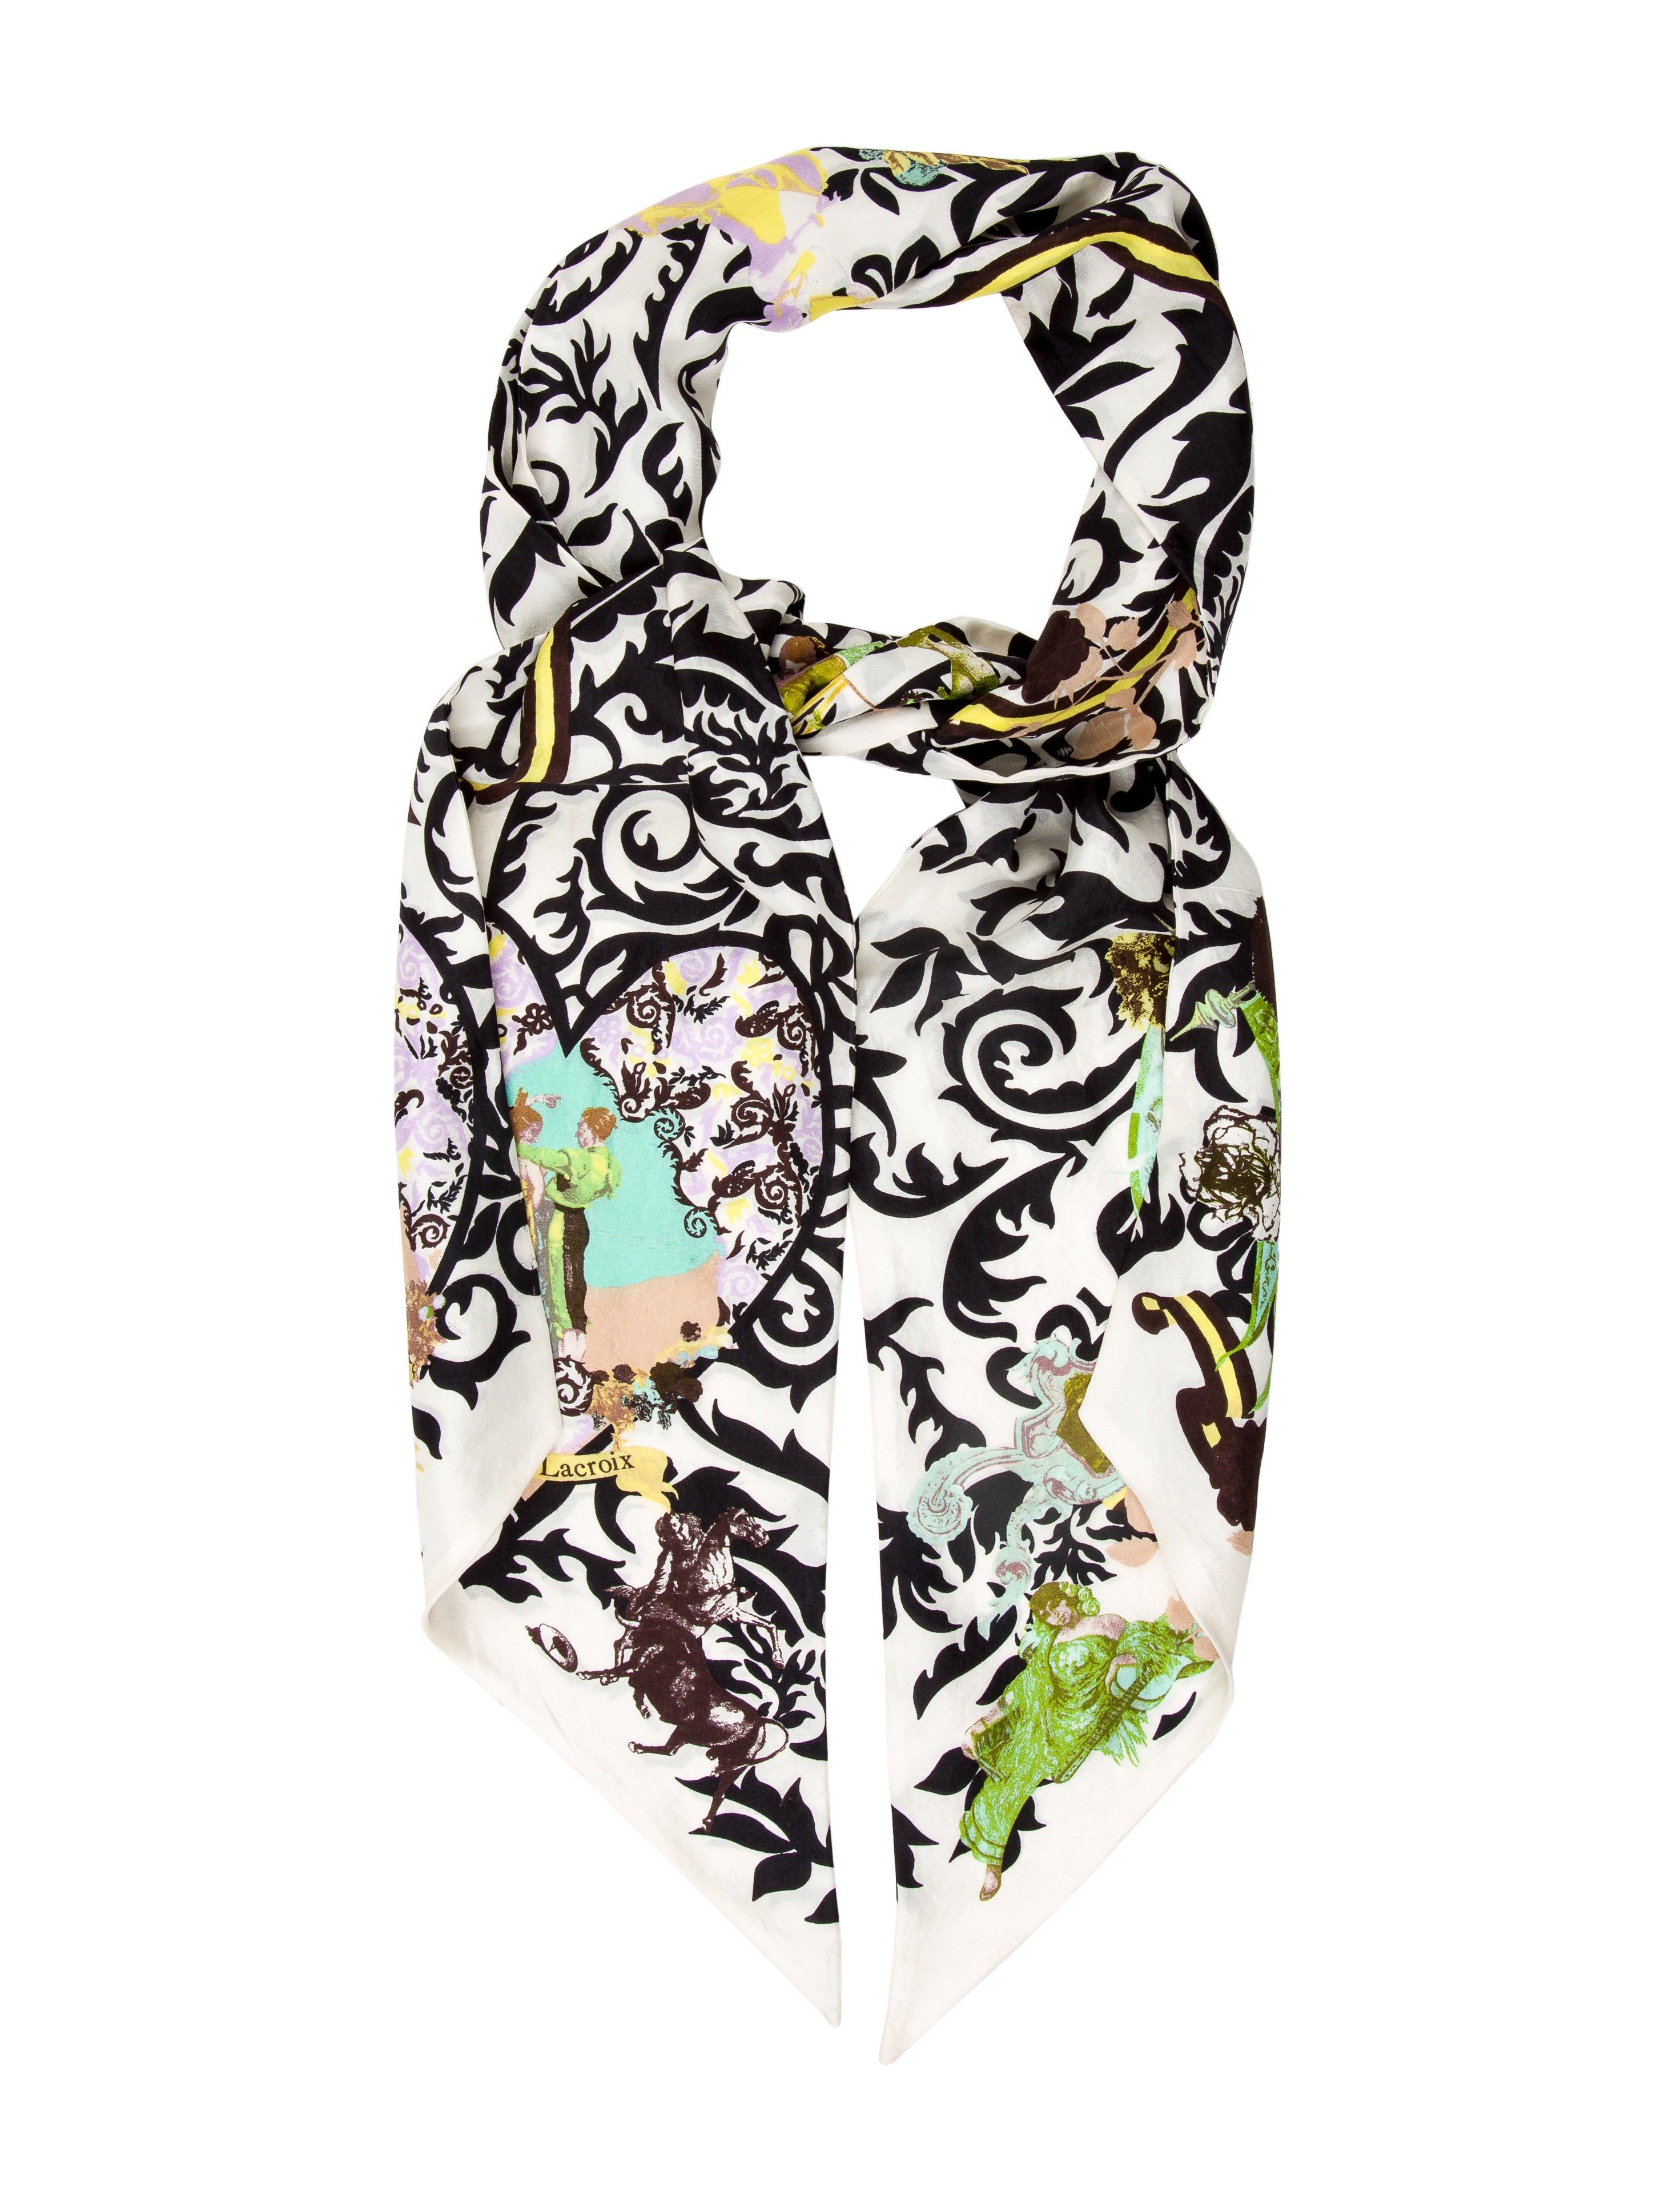 Christian lacroix multicolor printed scarf accessories chs21799 the rea - Christian lacroix accessories ...